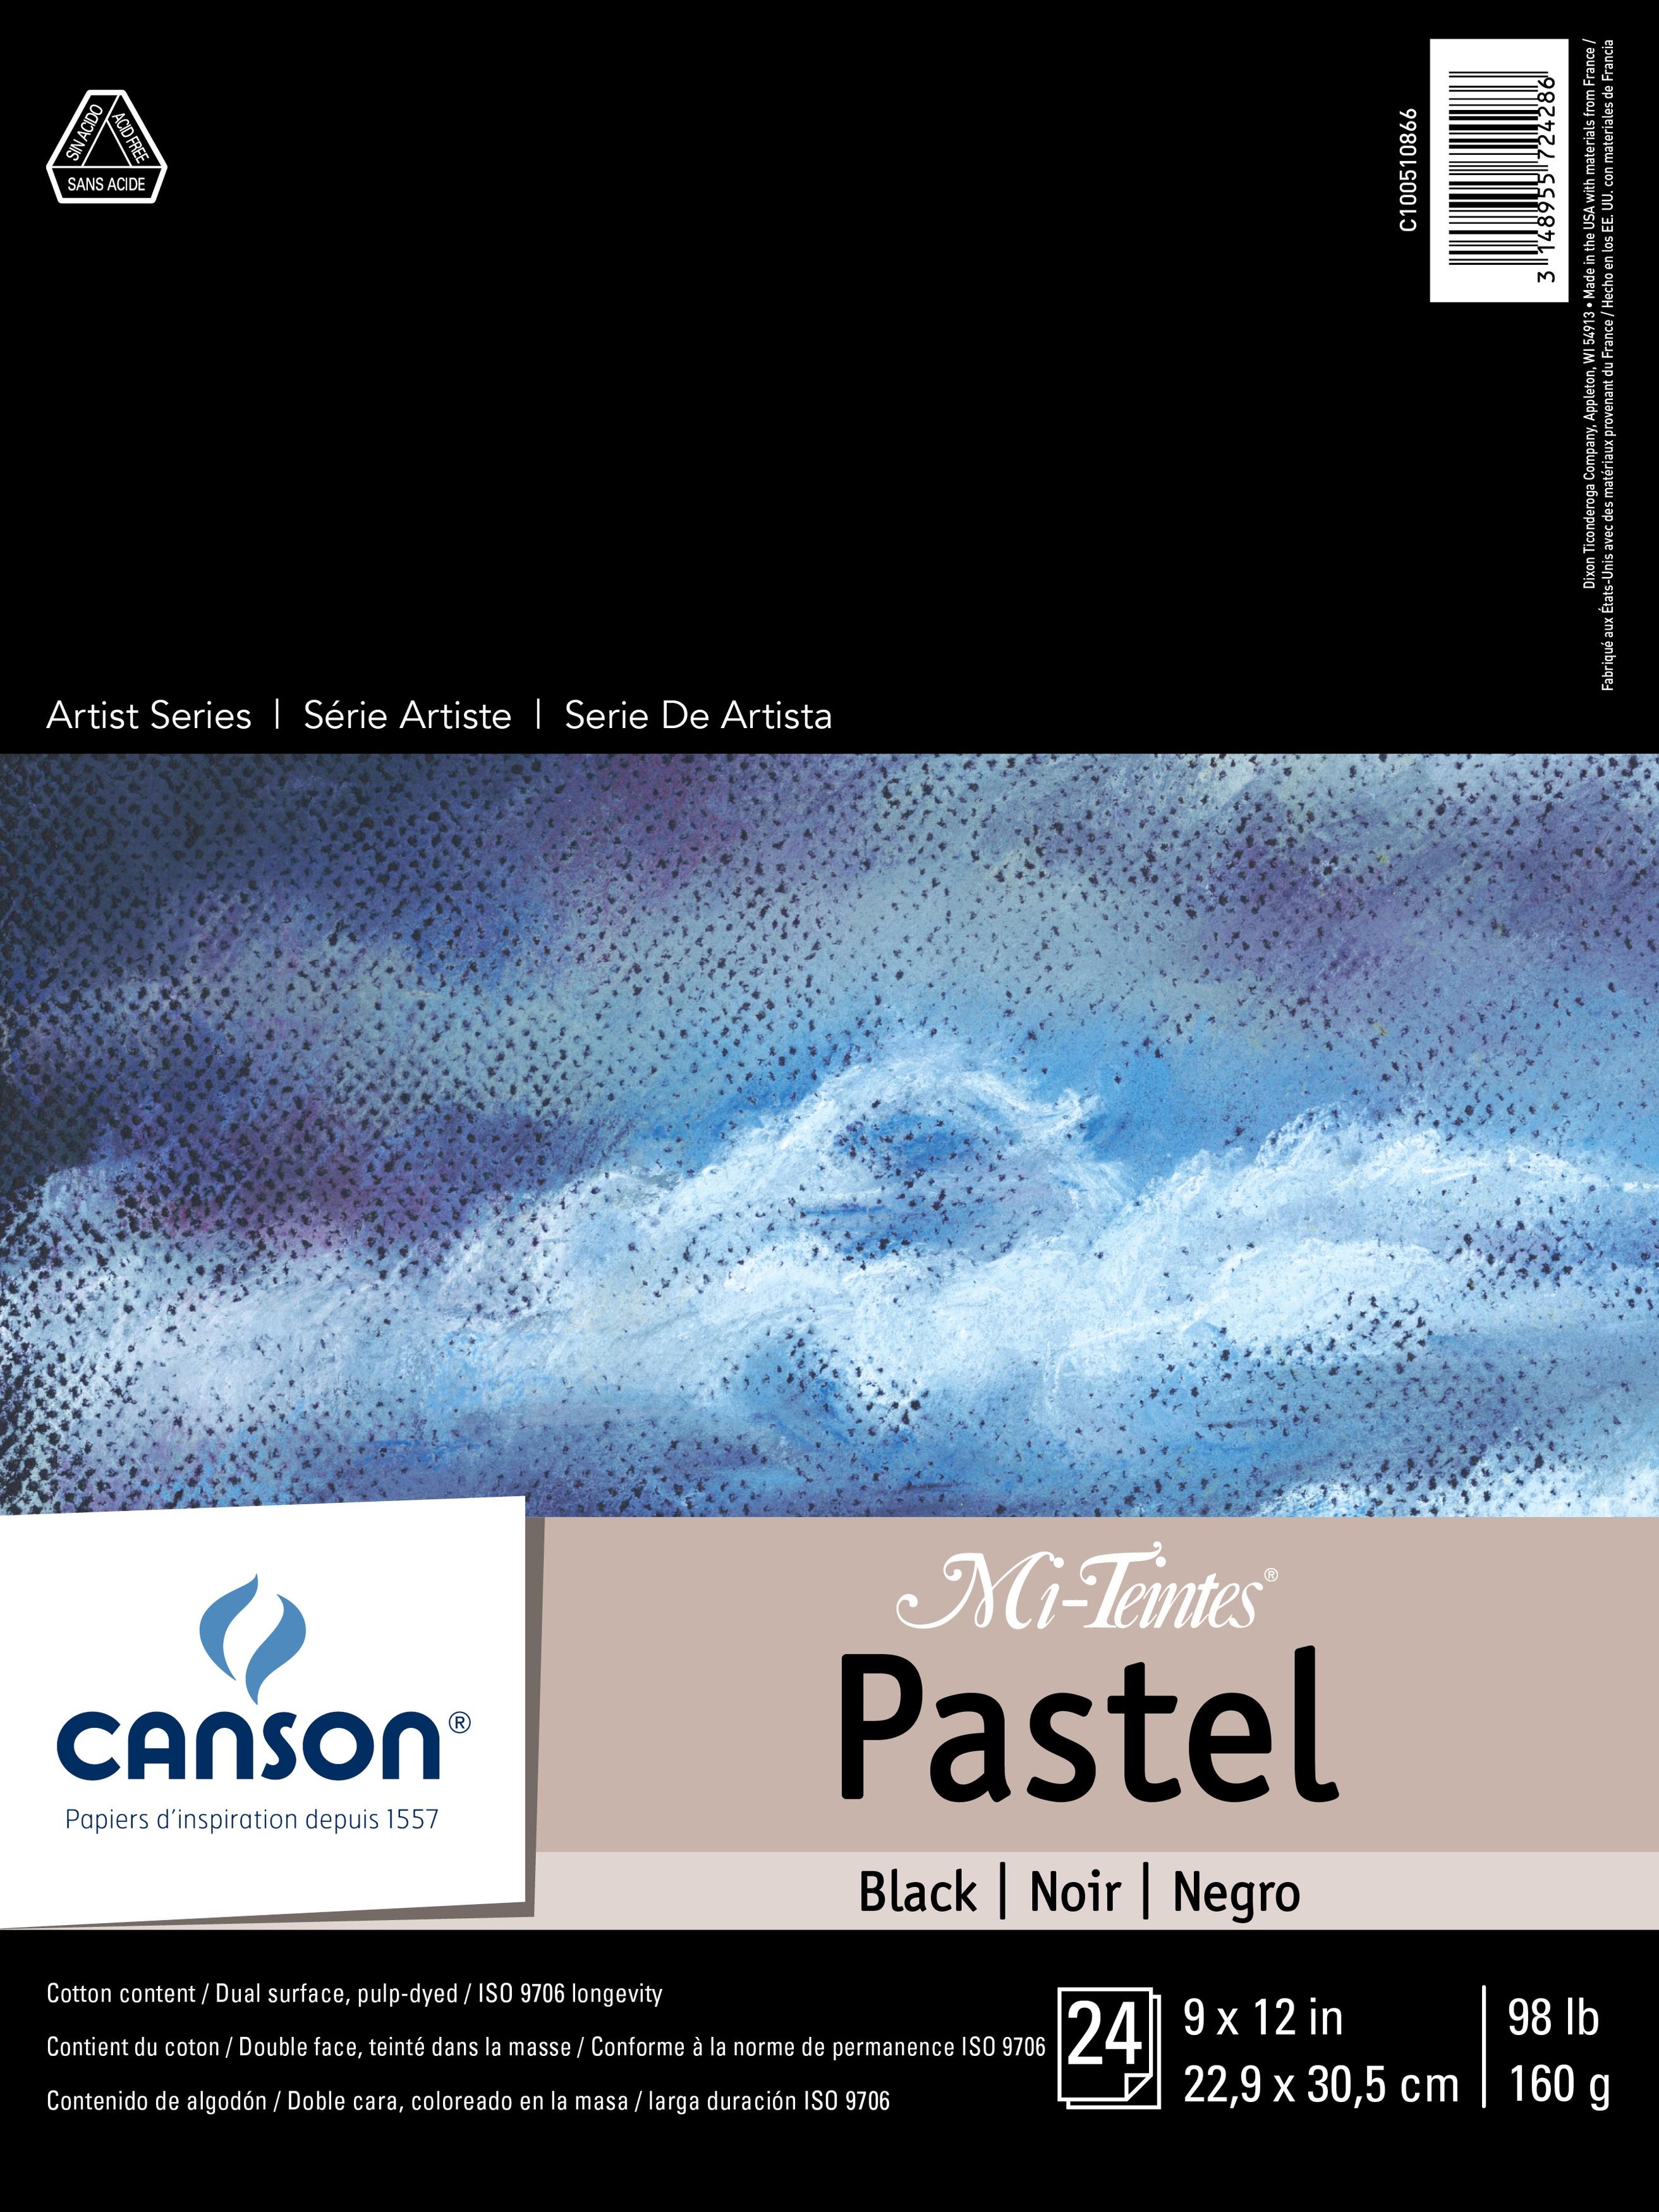 Canson Mi-Teintes Pastel Black Paper Pad